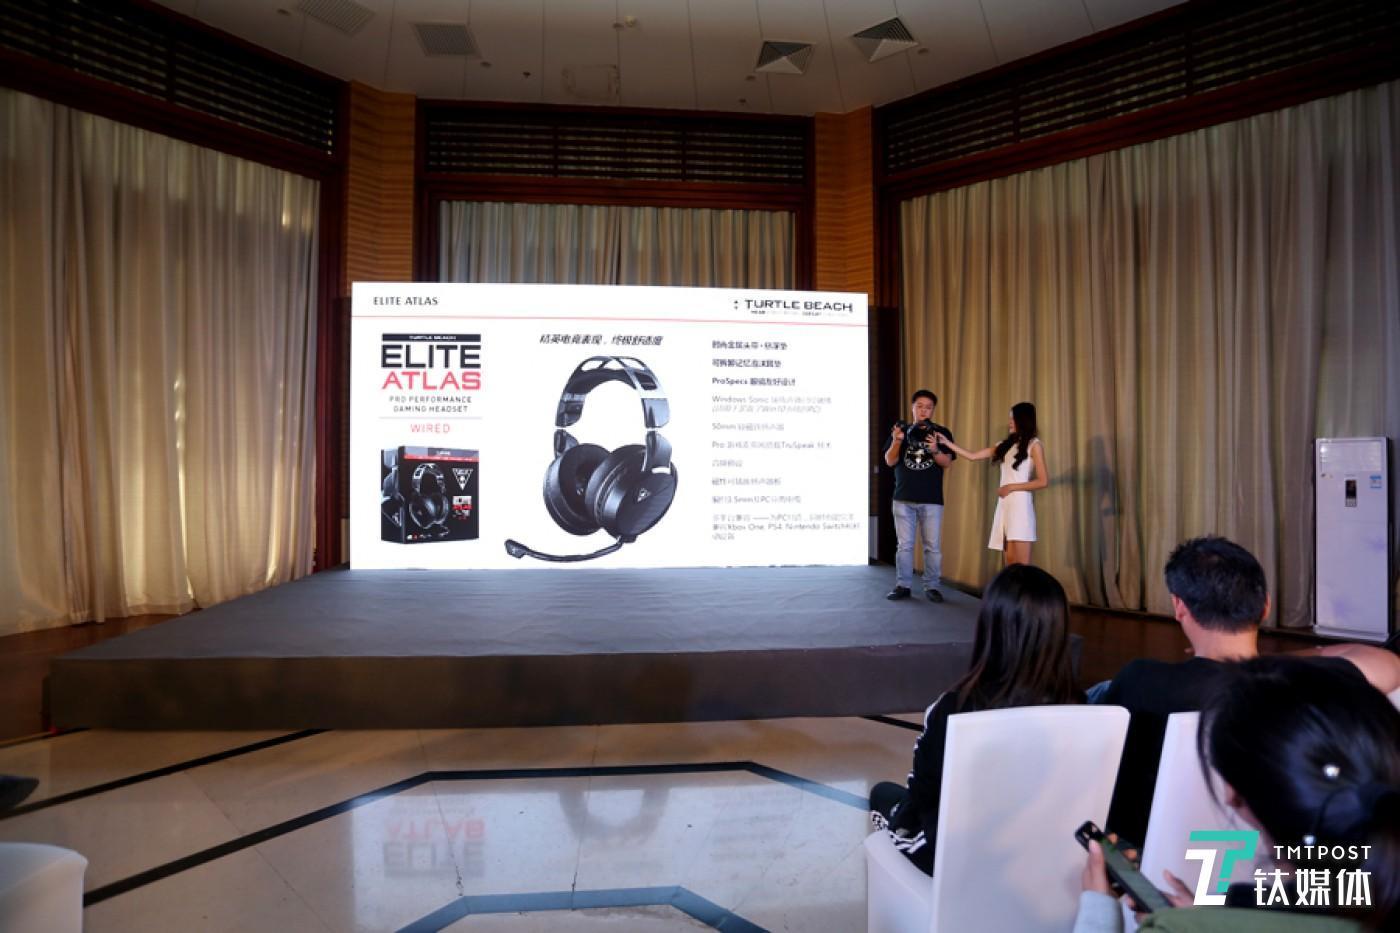 ELITE ATLAS具备50mm铷磁铁扬声器